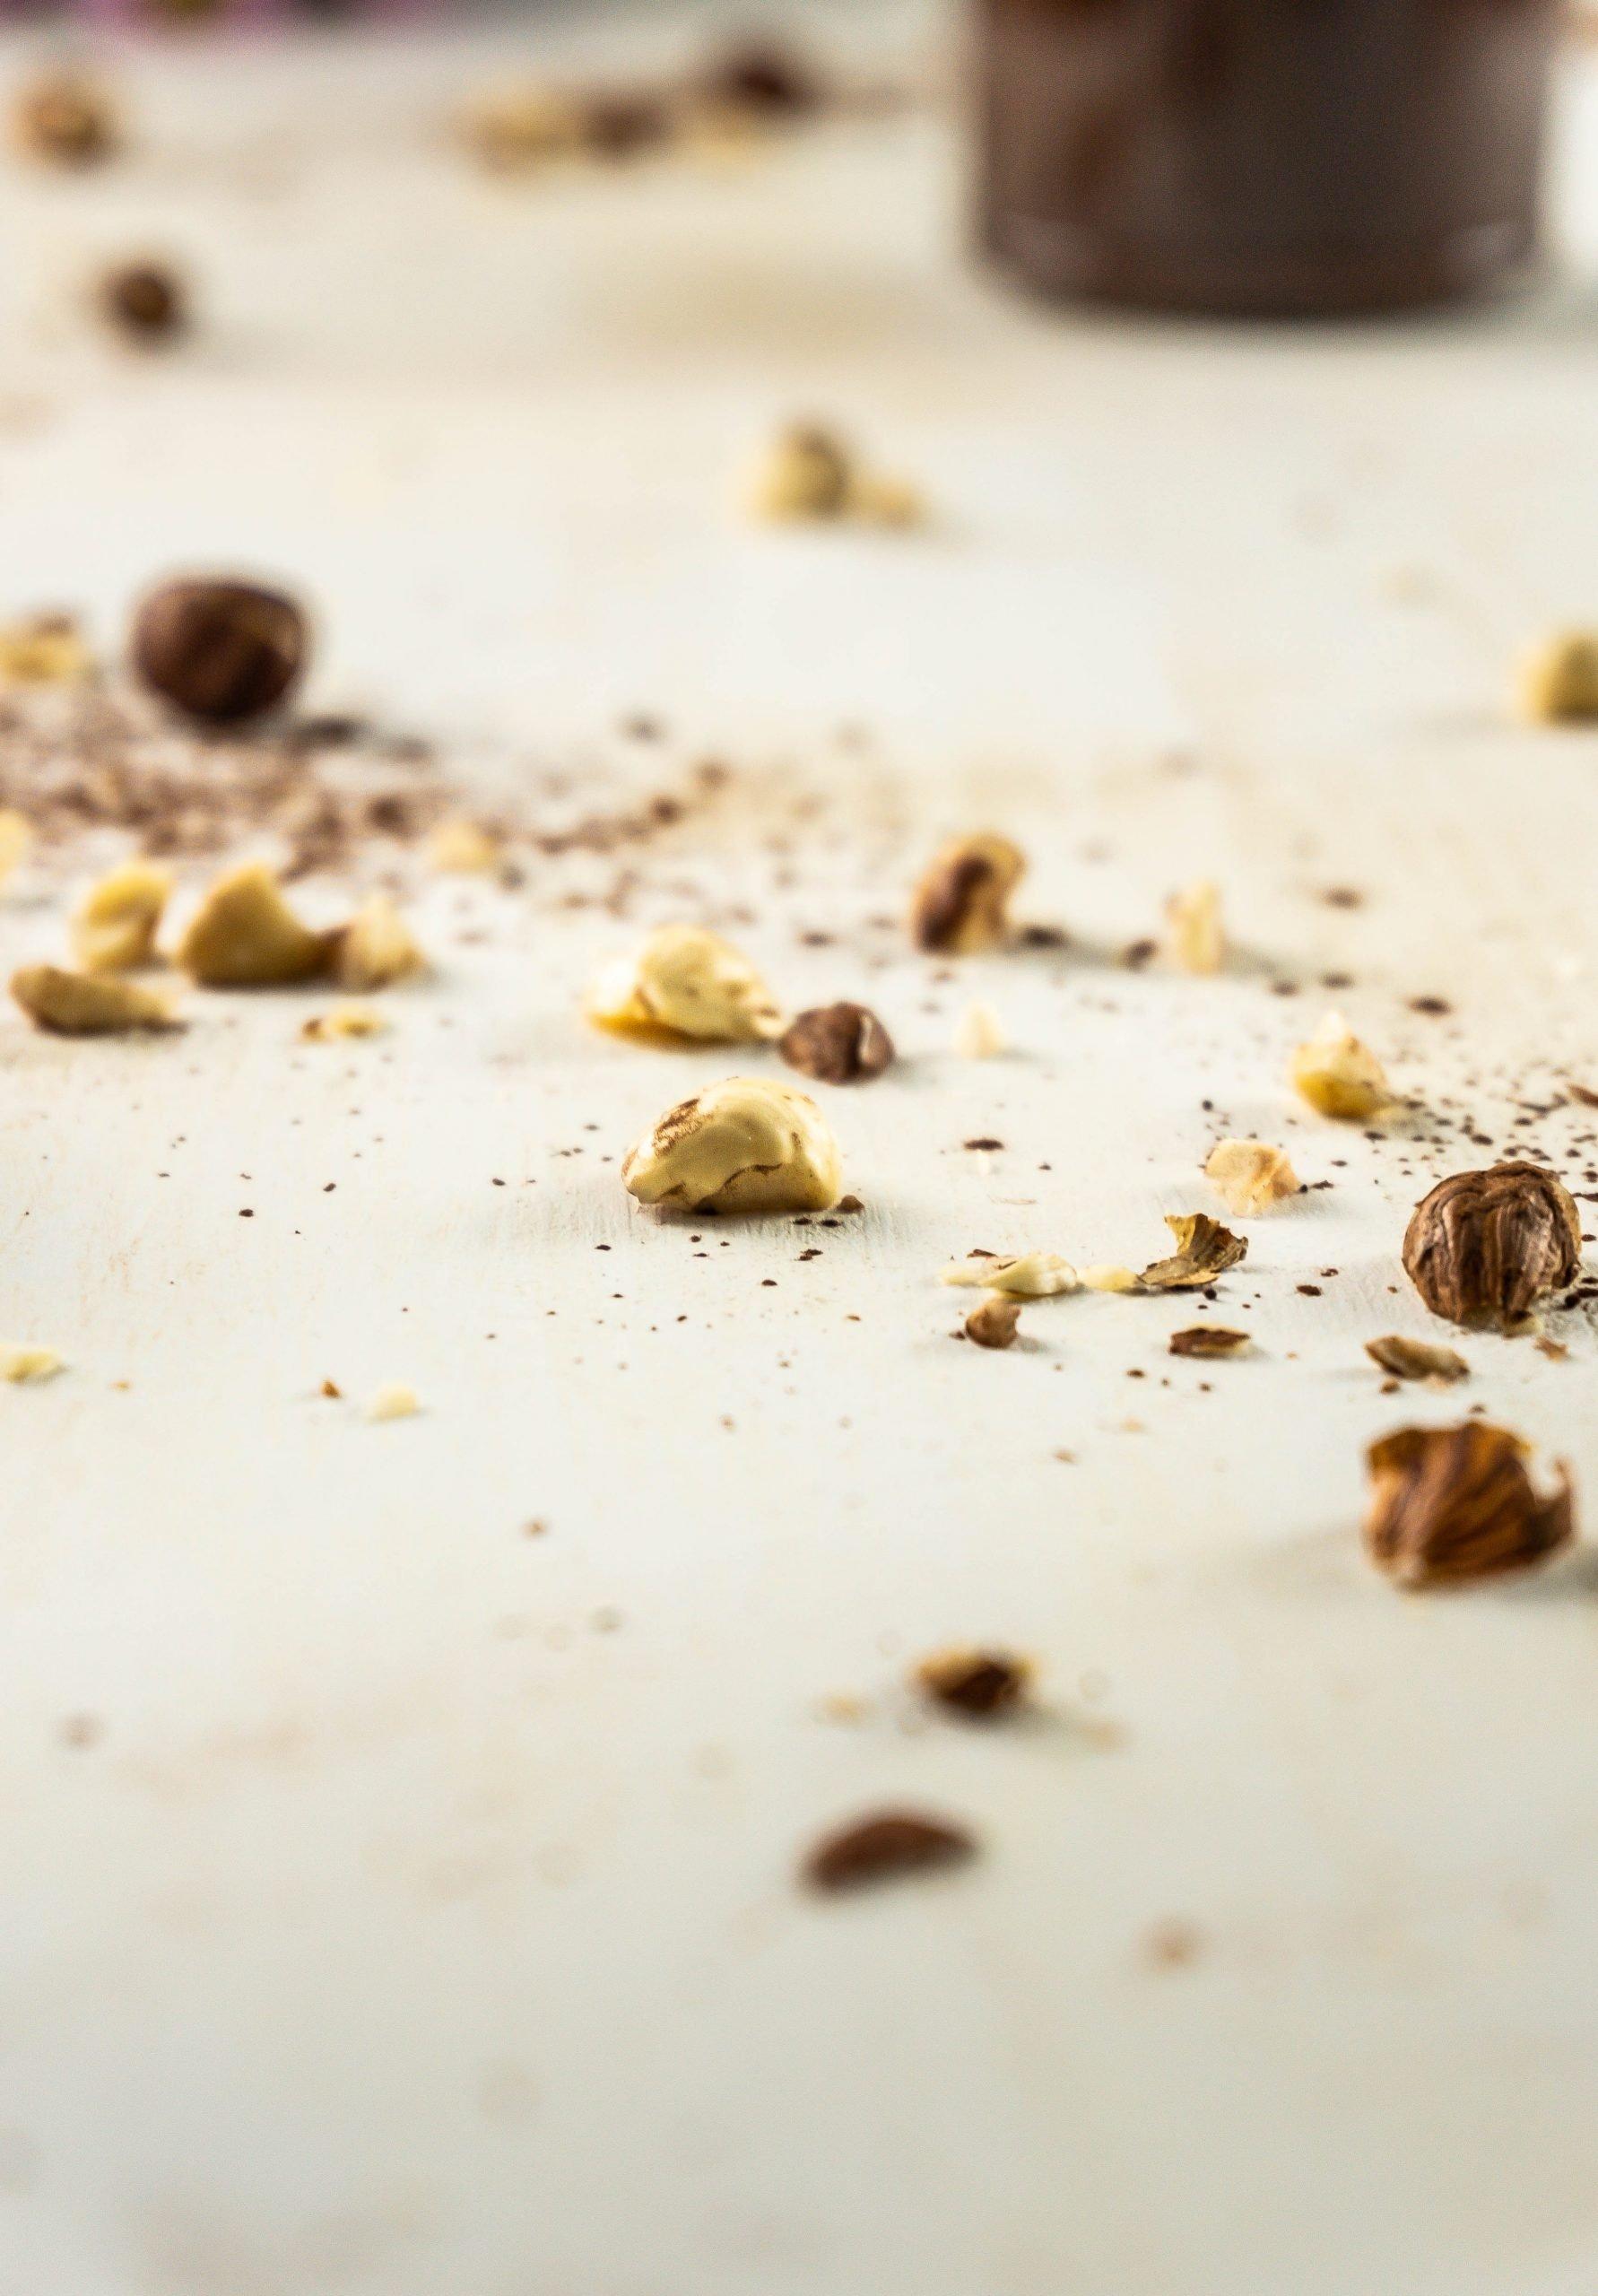 Chopped hazelnuts on a white background